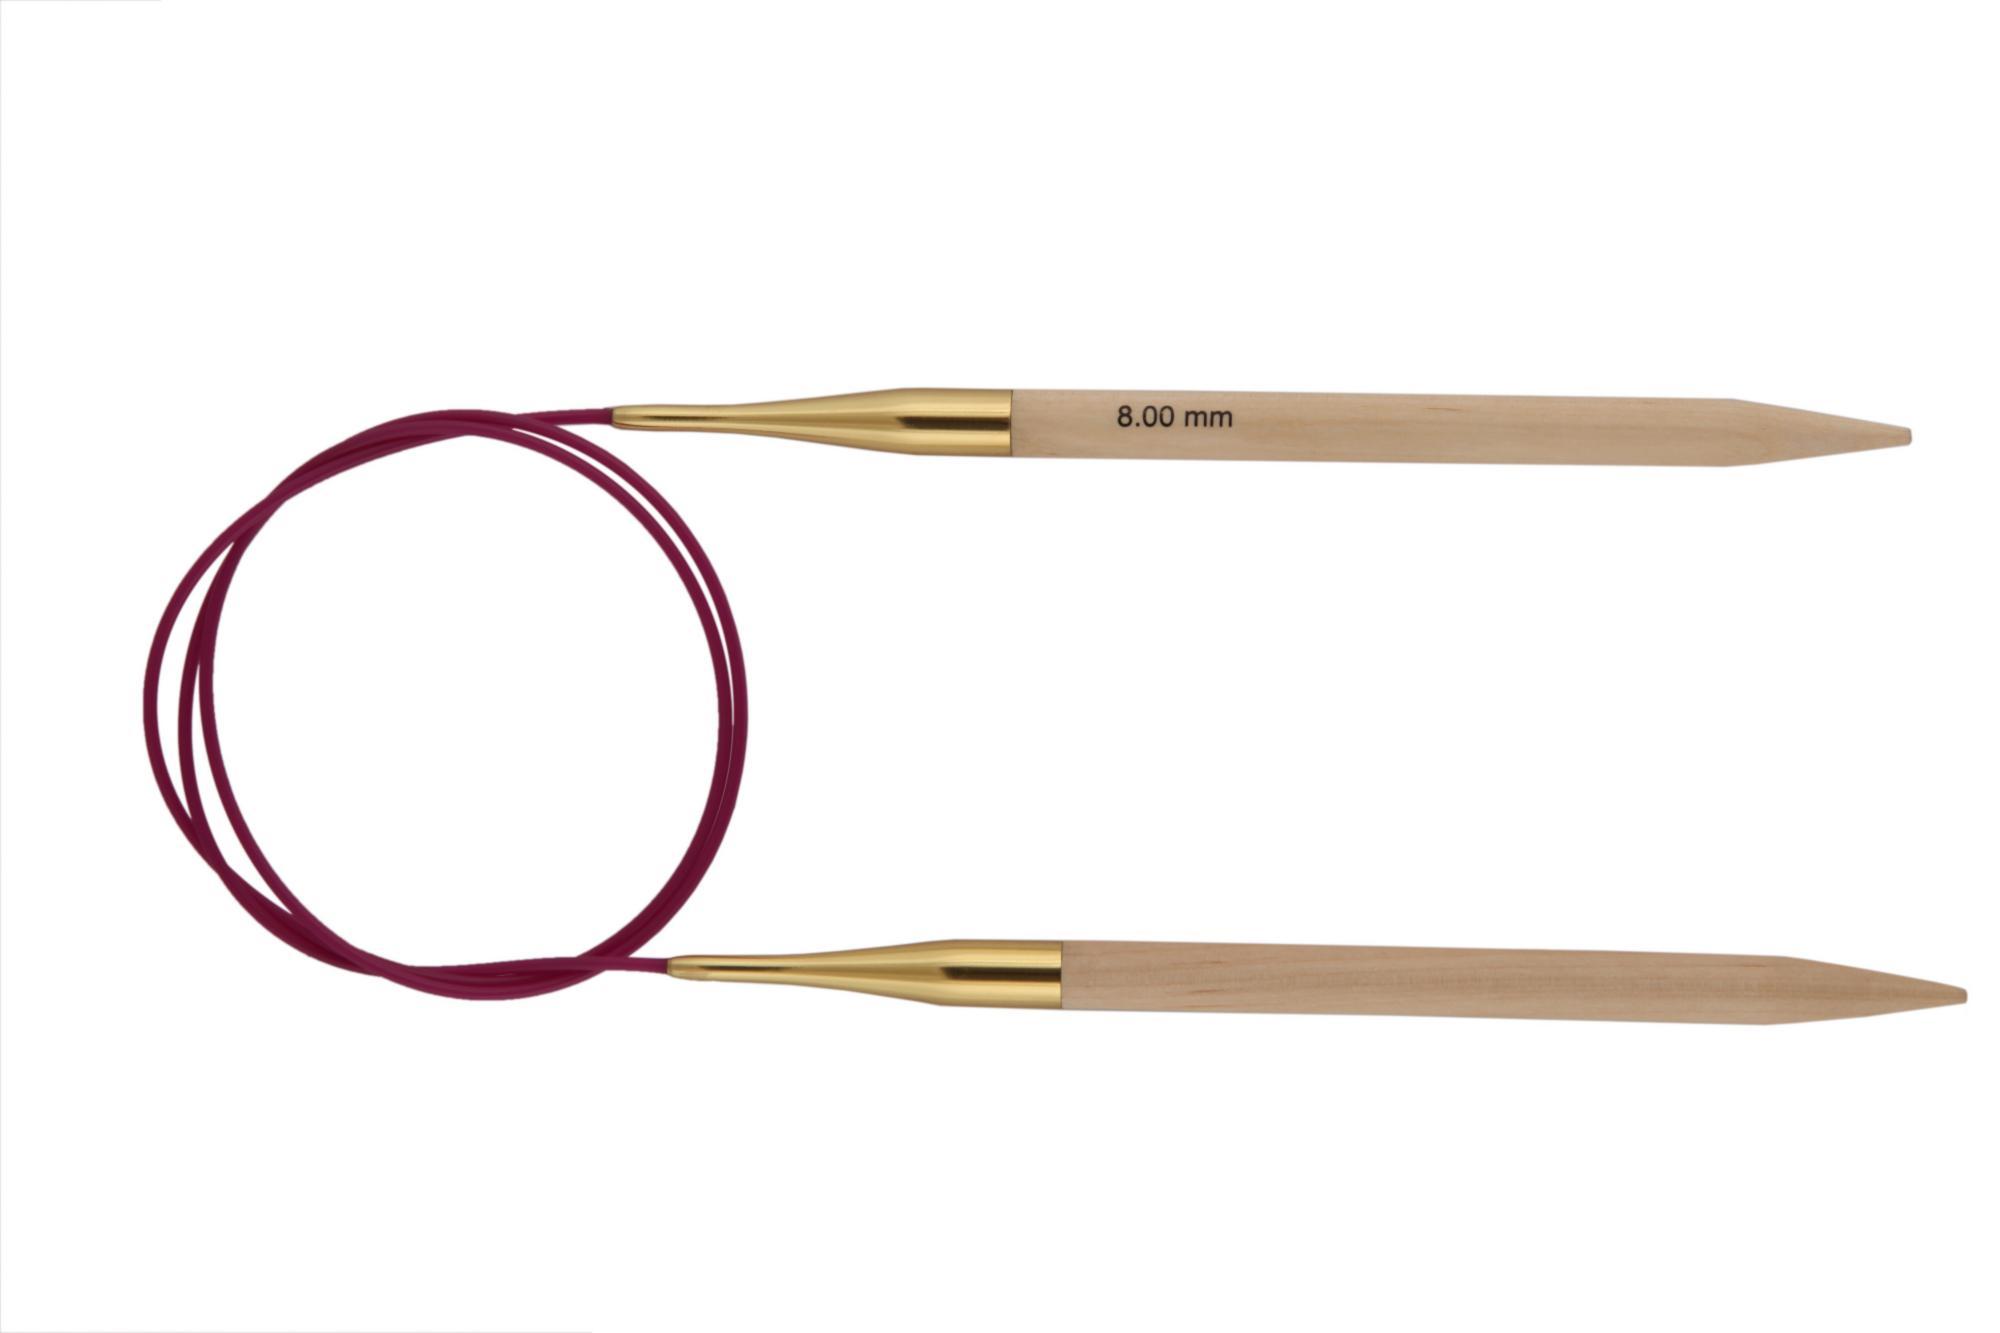 Спицы круговые 100 см Basix Birch Wood KnitPro, 35345, 8.00 мм